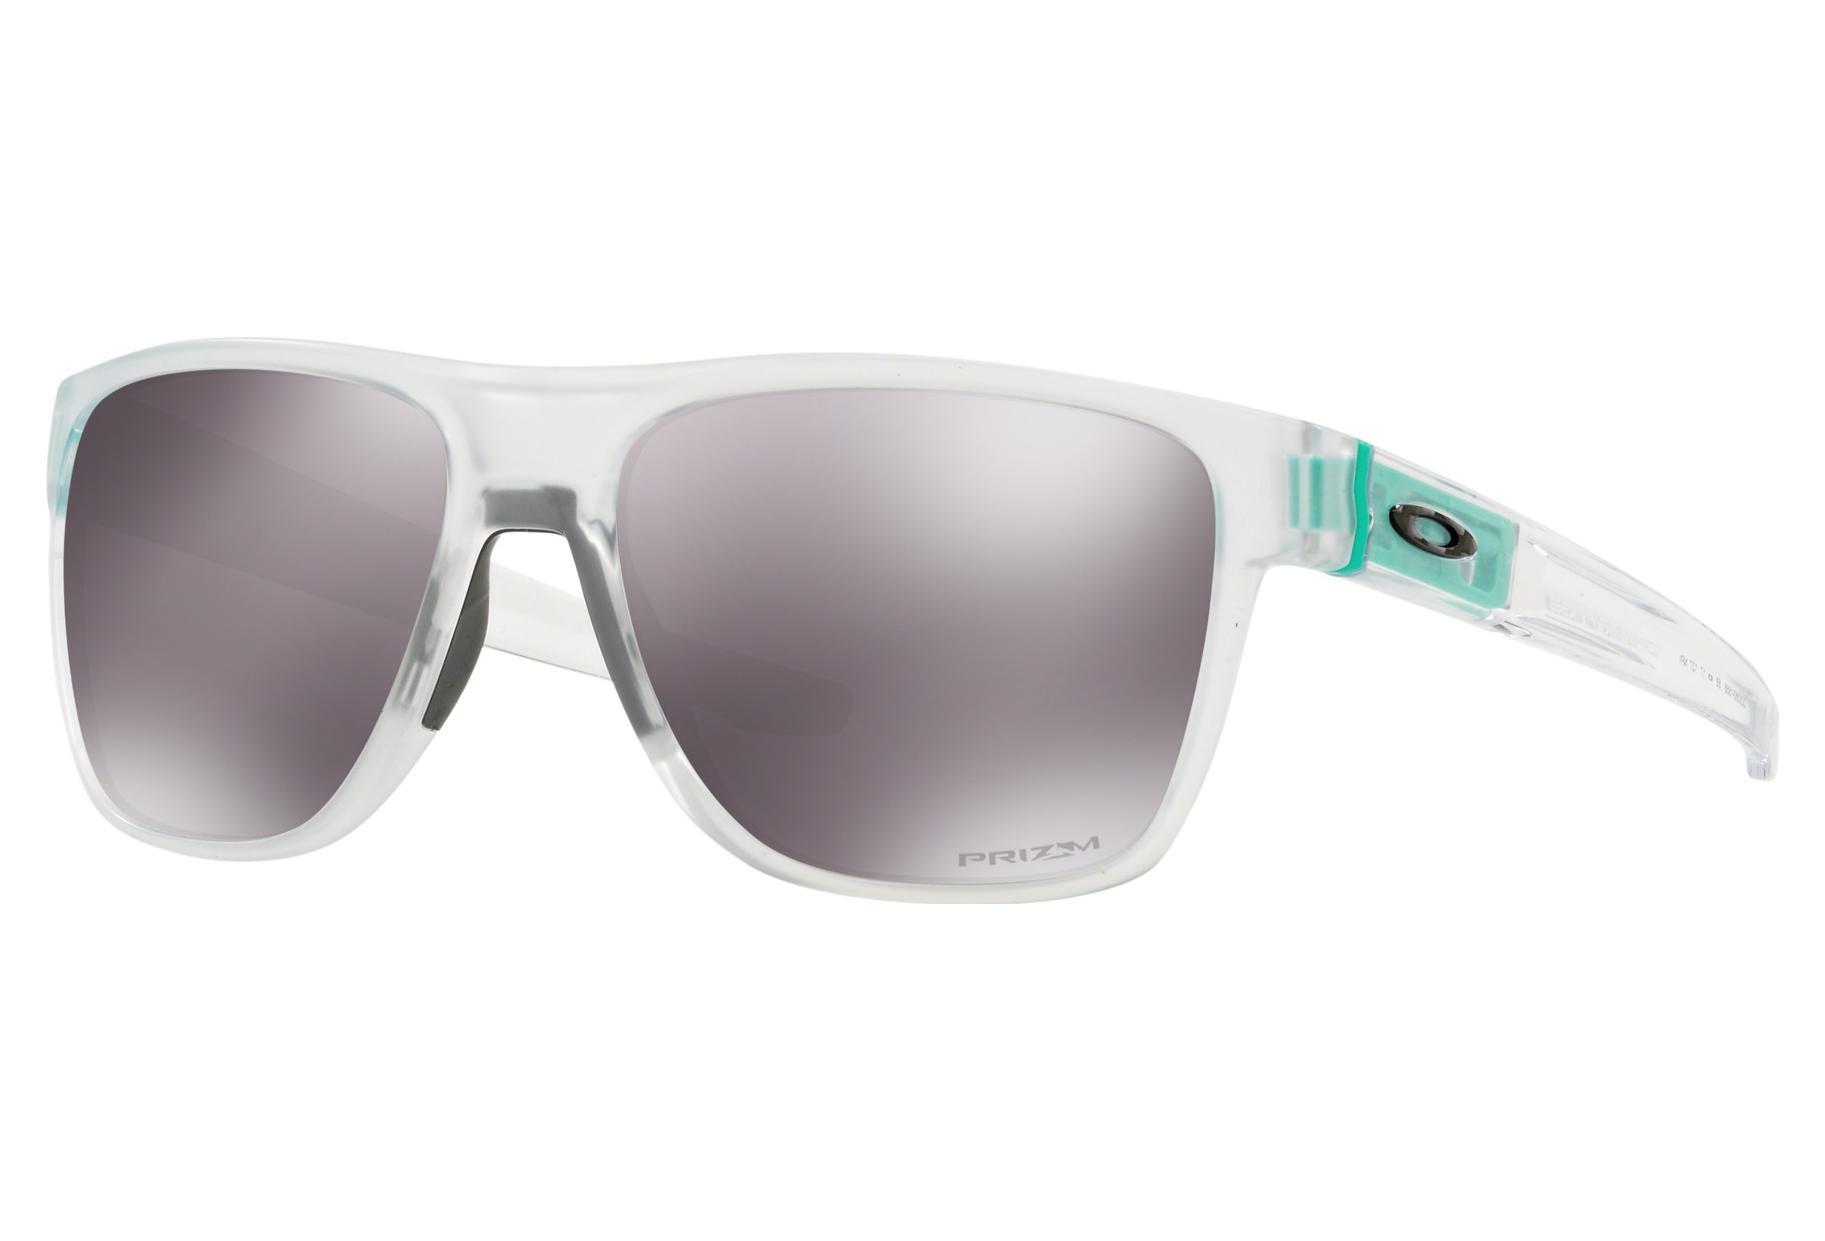 Oakley Sunglasses Crossrange XL Crystal Clear   Prizm Black   Ref.  OO9360-1958 750995c4f595